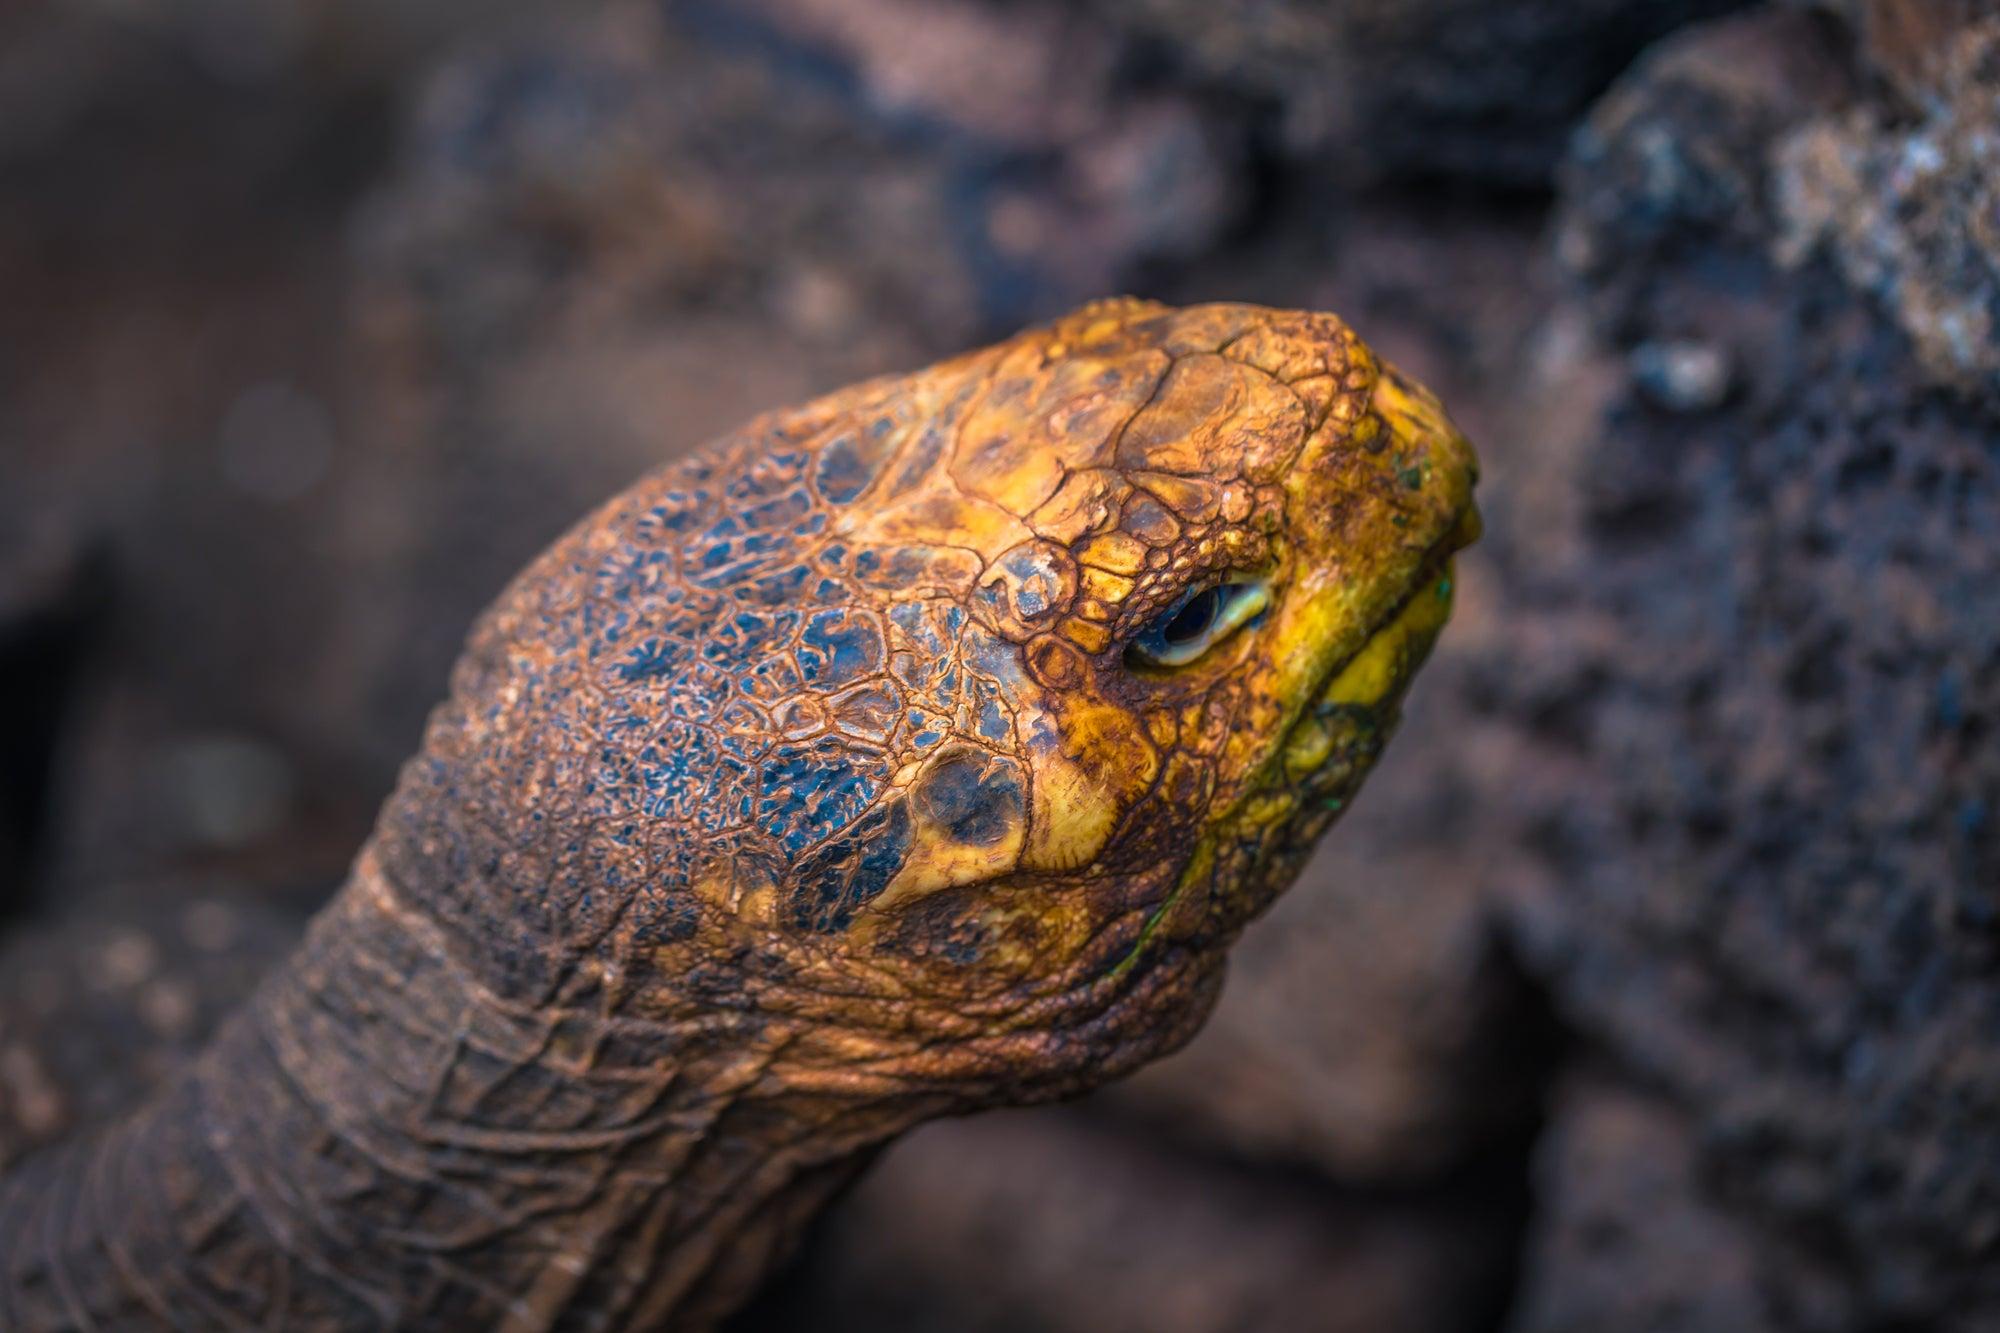 Diego the giant tortoise at a captive-breeding facility